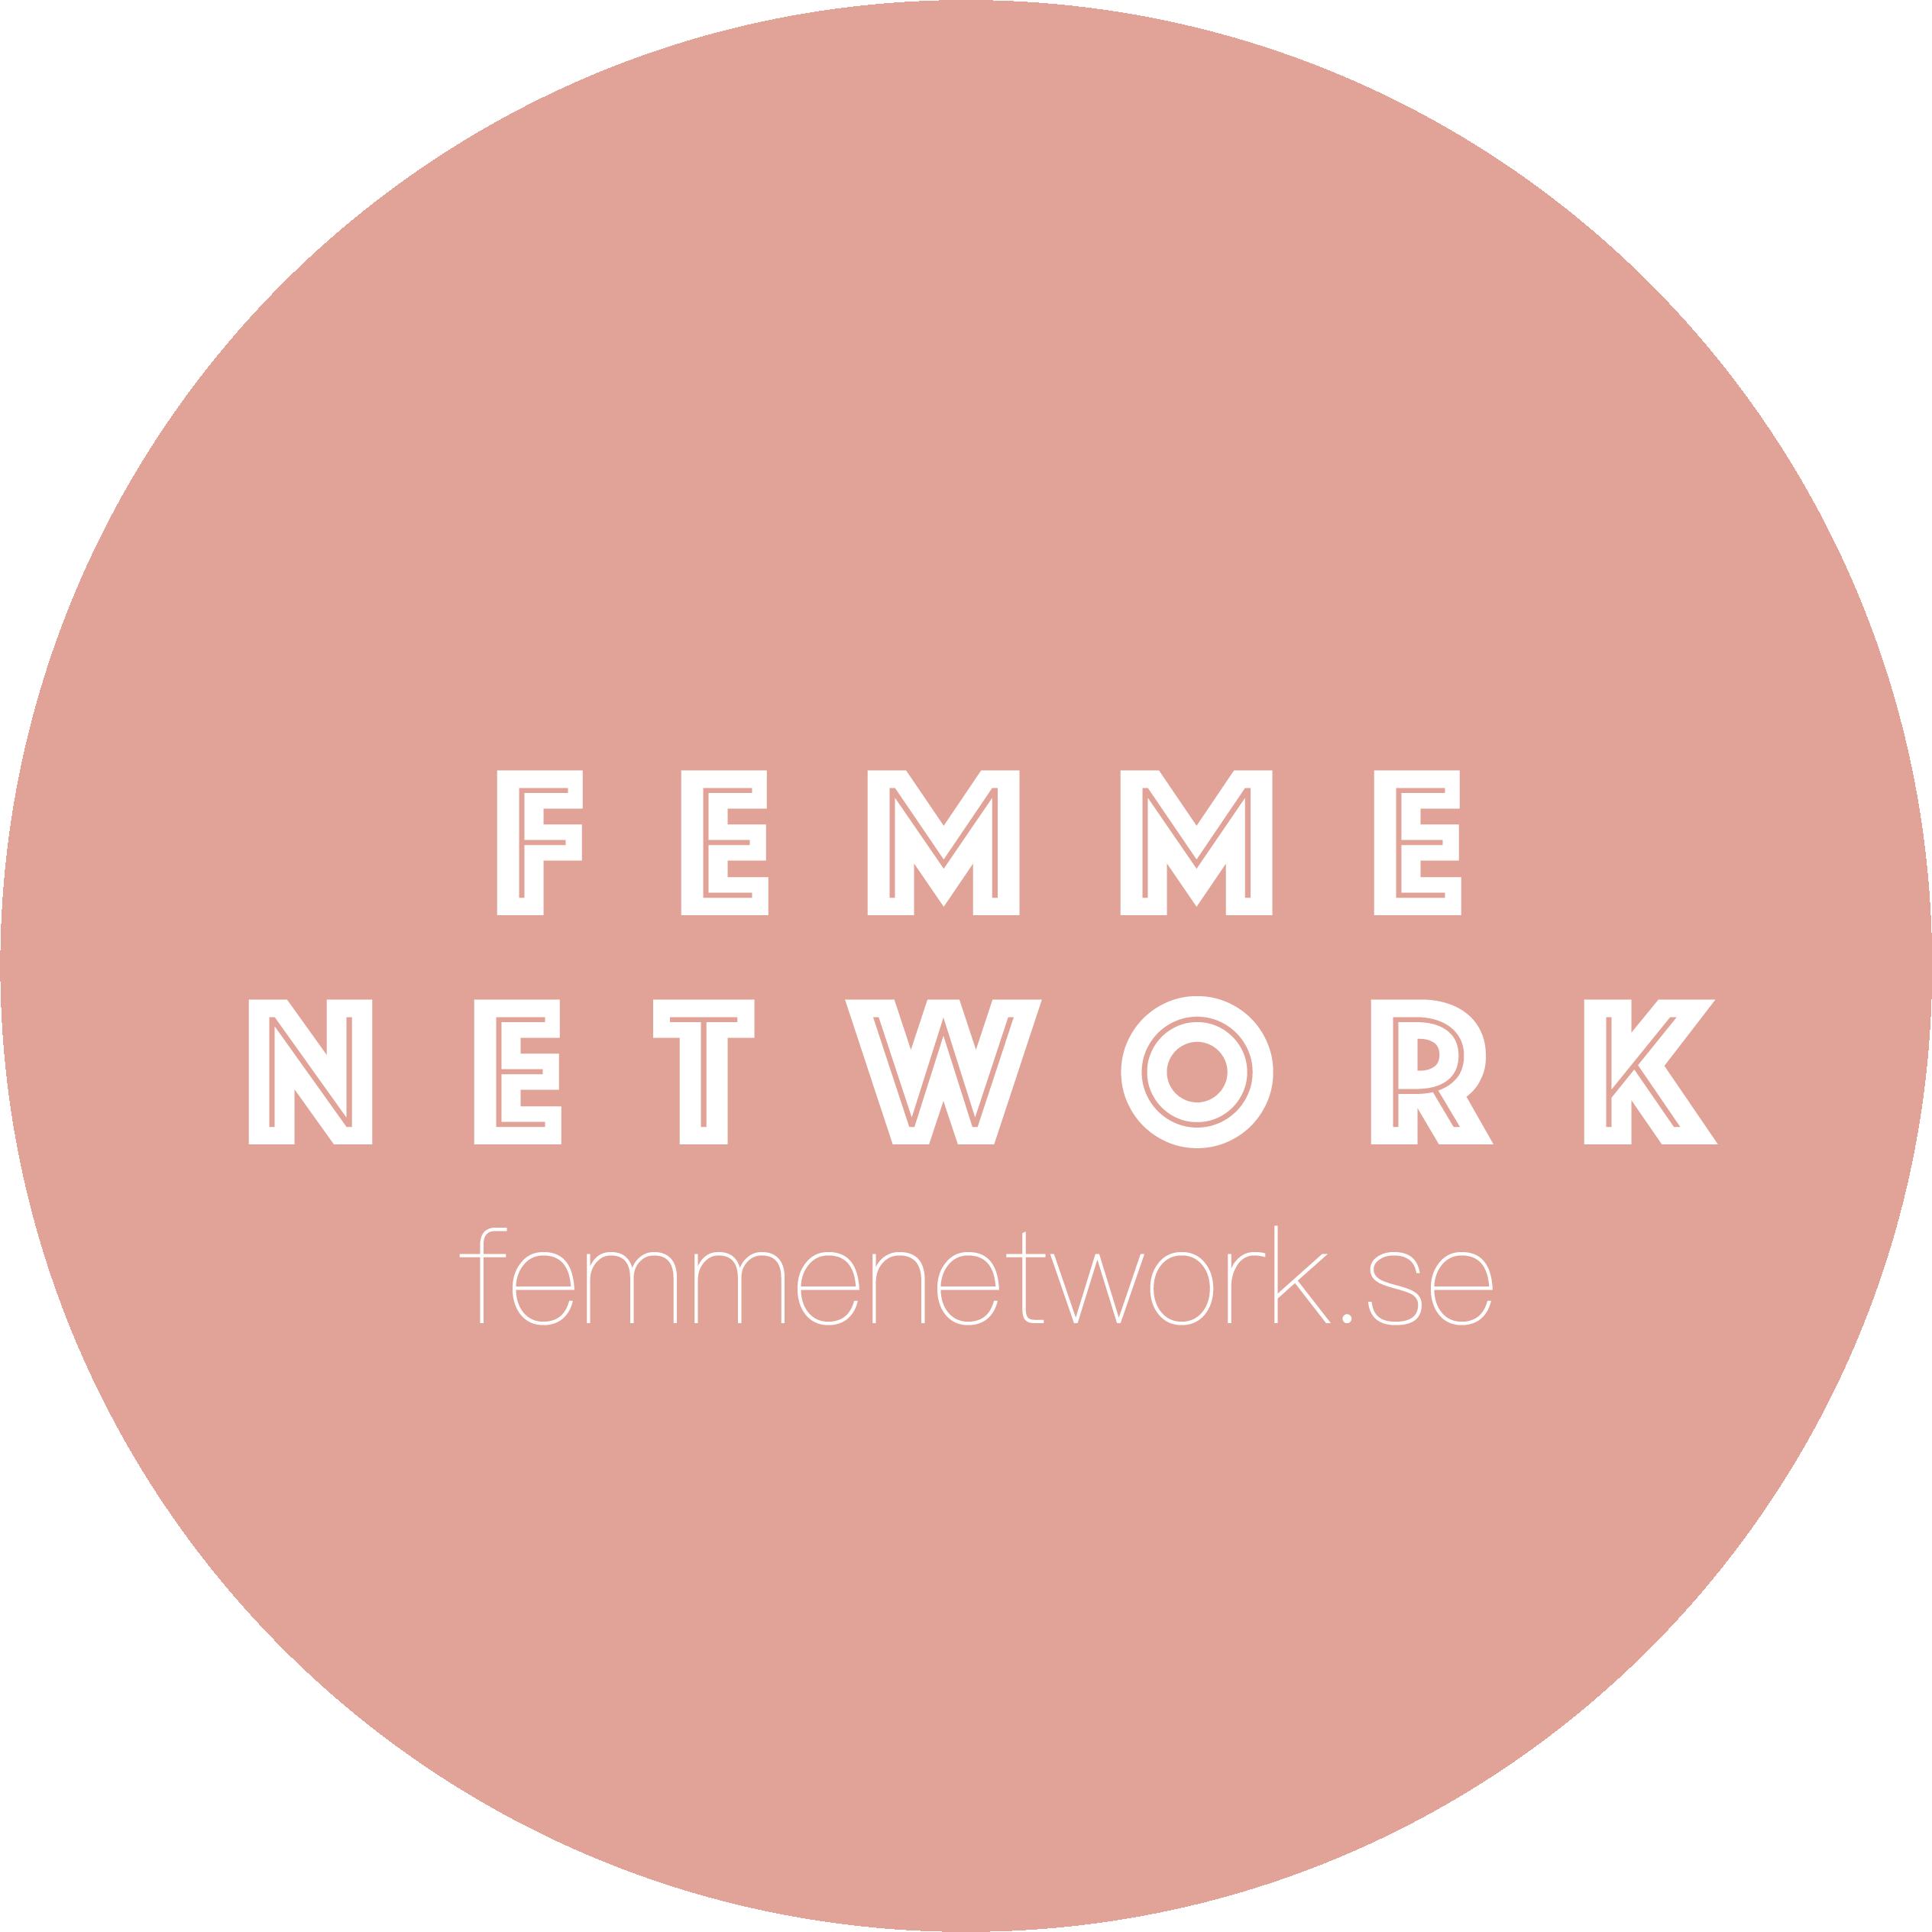 Femme Network